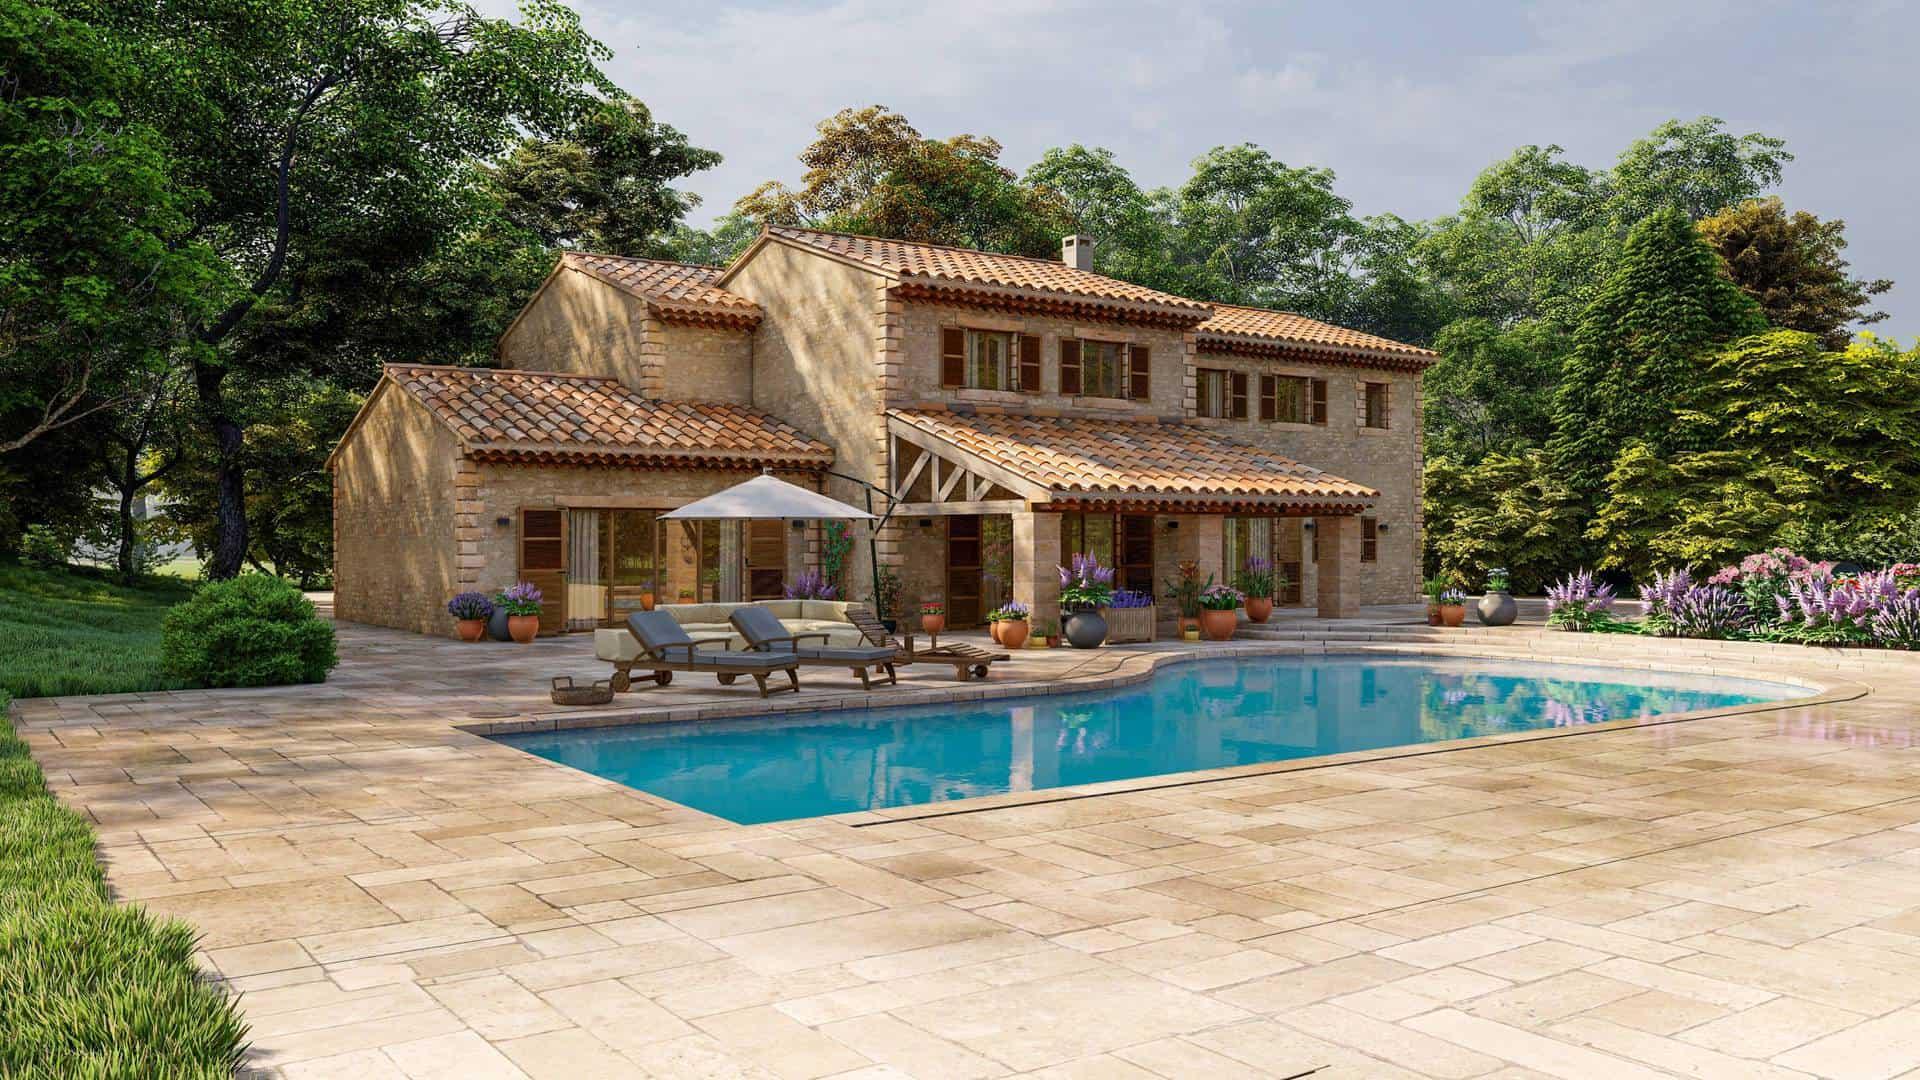 maison traditionnelle style